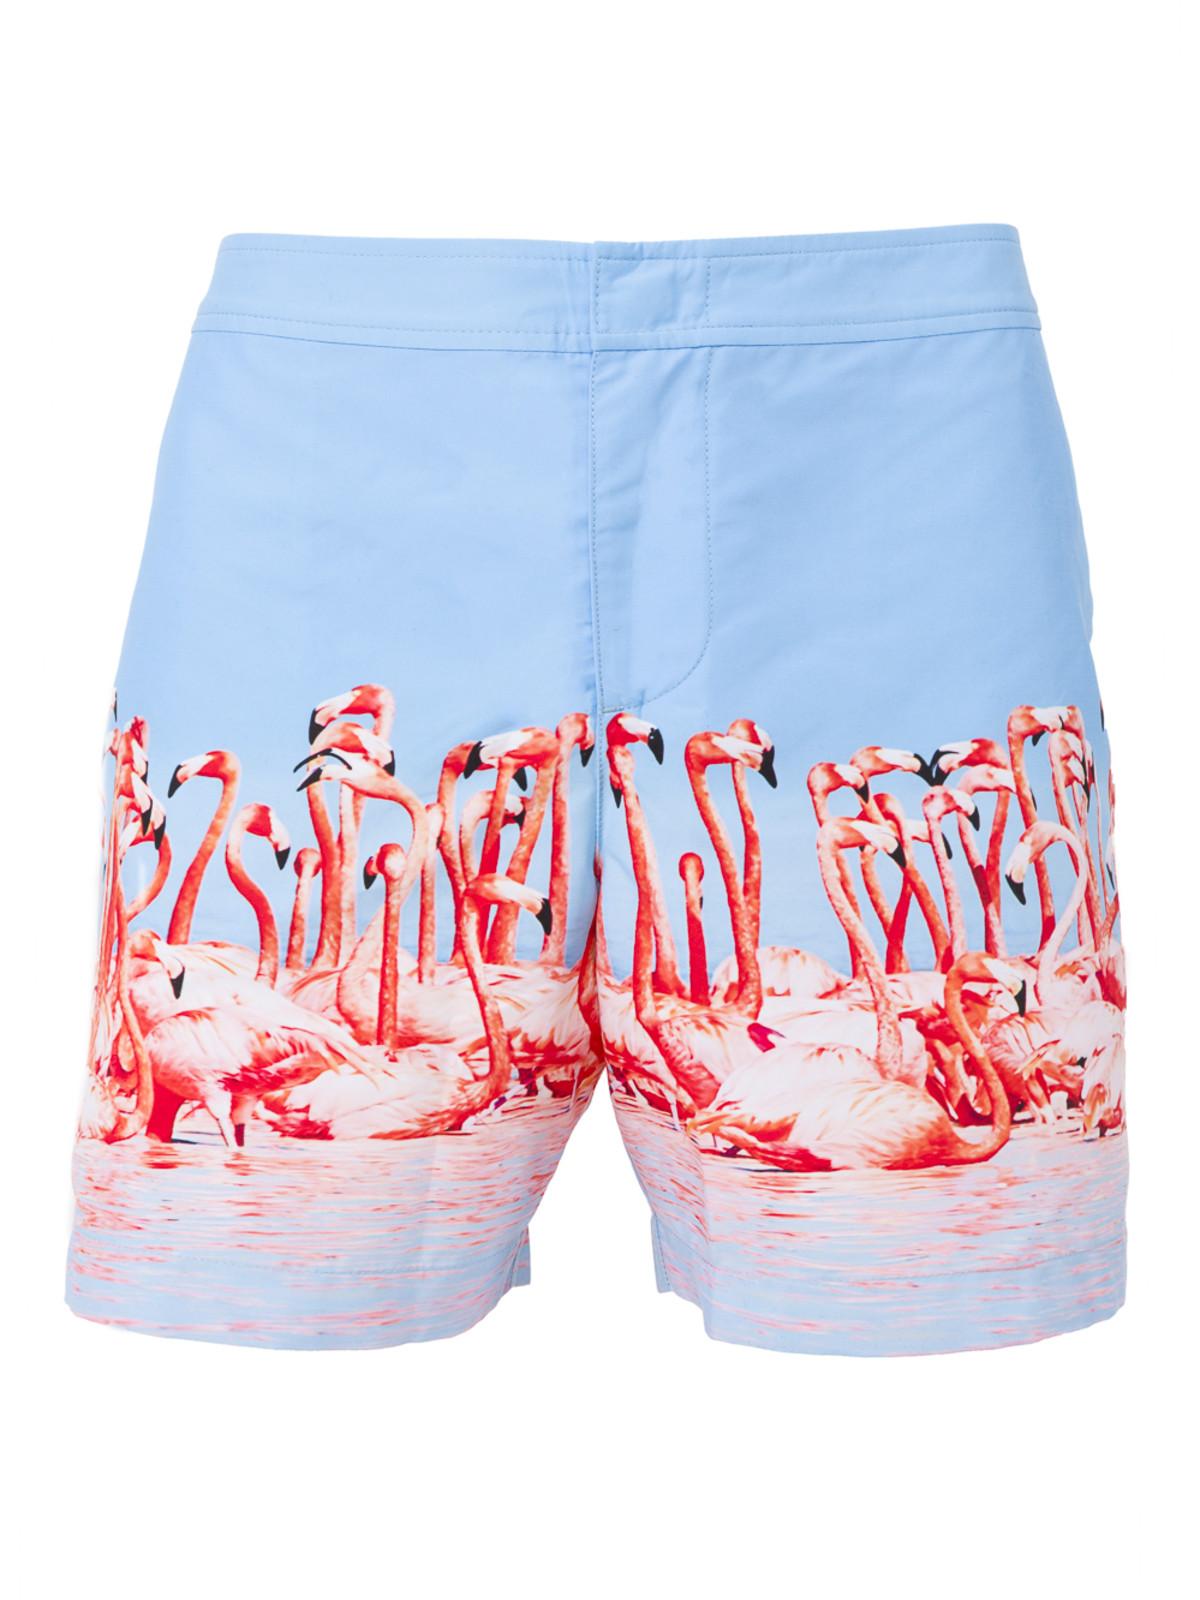 Orlebar Brown flamingo swim shorts in The Webster Lane Crawford collaboration